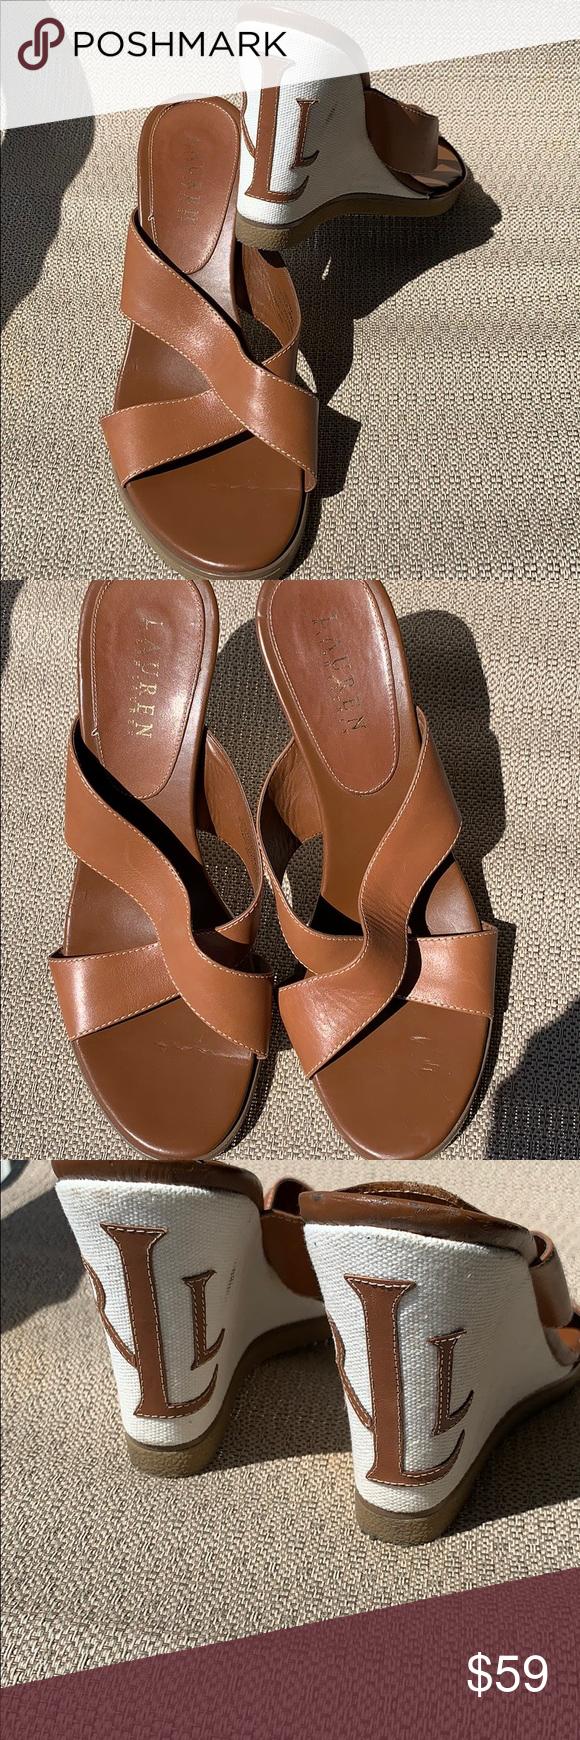 Lauren Ralph Lauren shoes | Ralph lauren shoes, Shoes